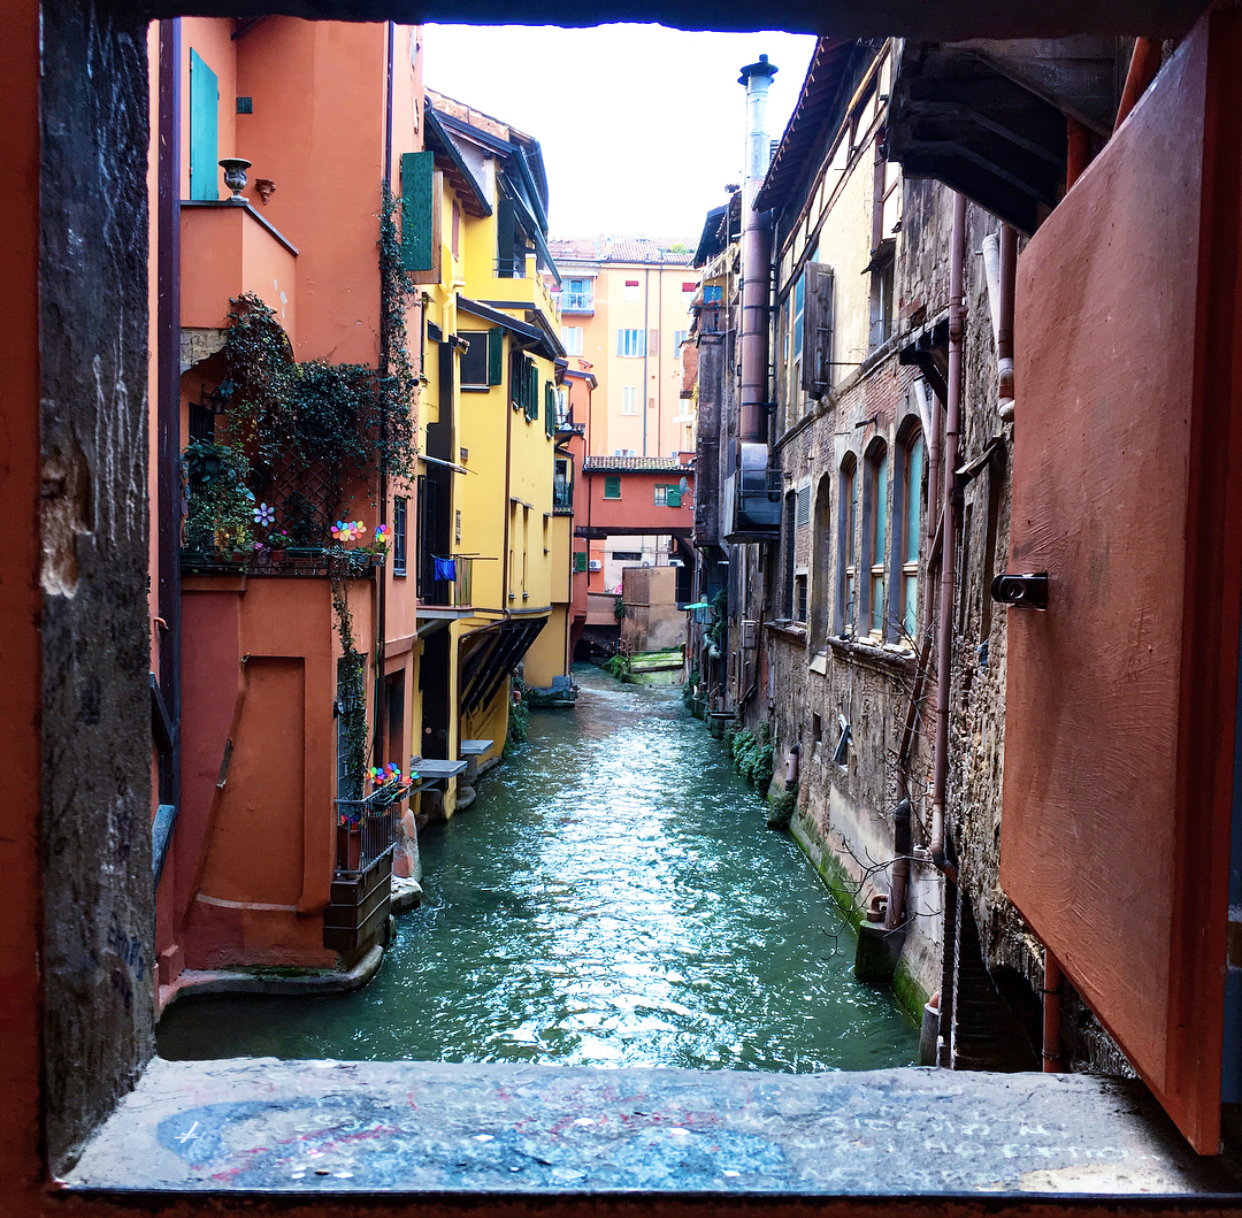 La Piccola Venezia.